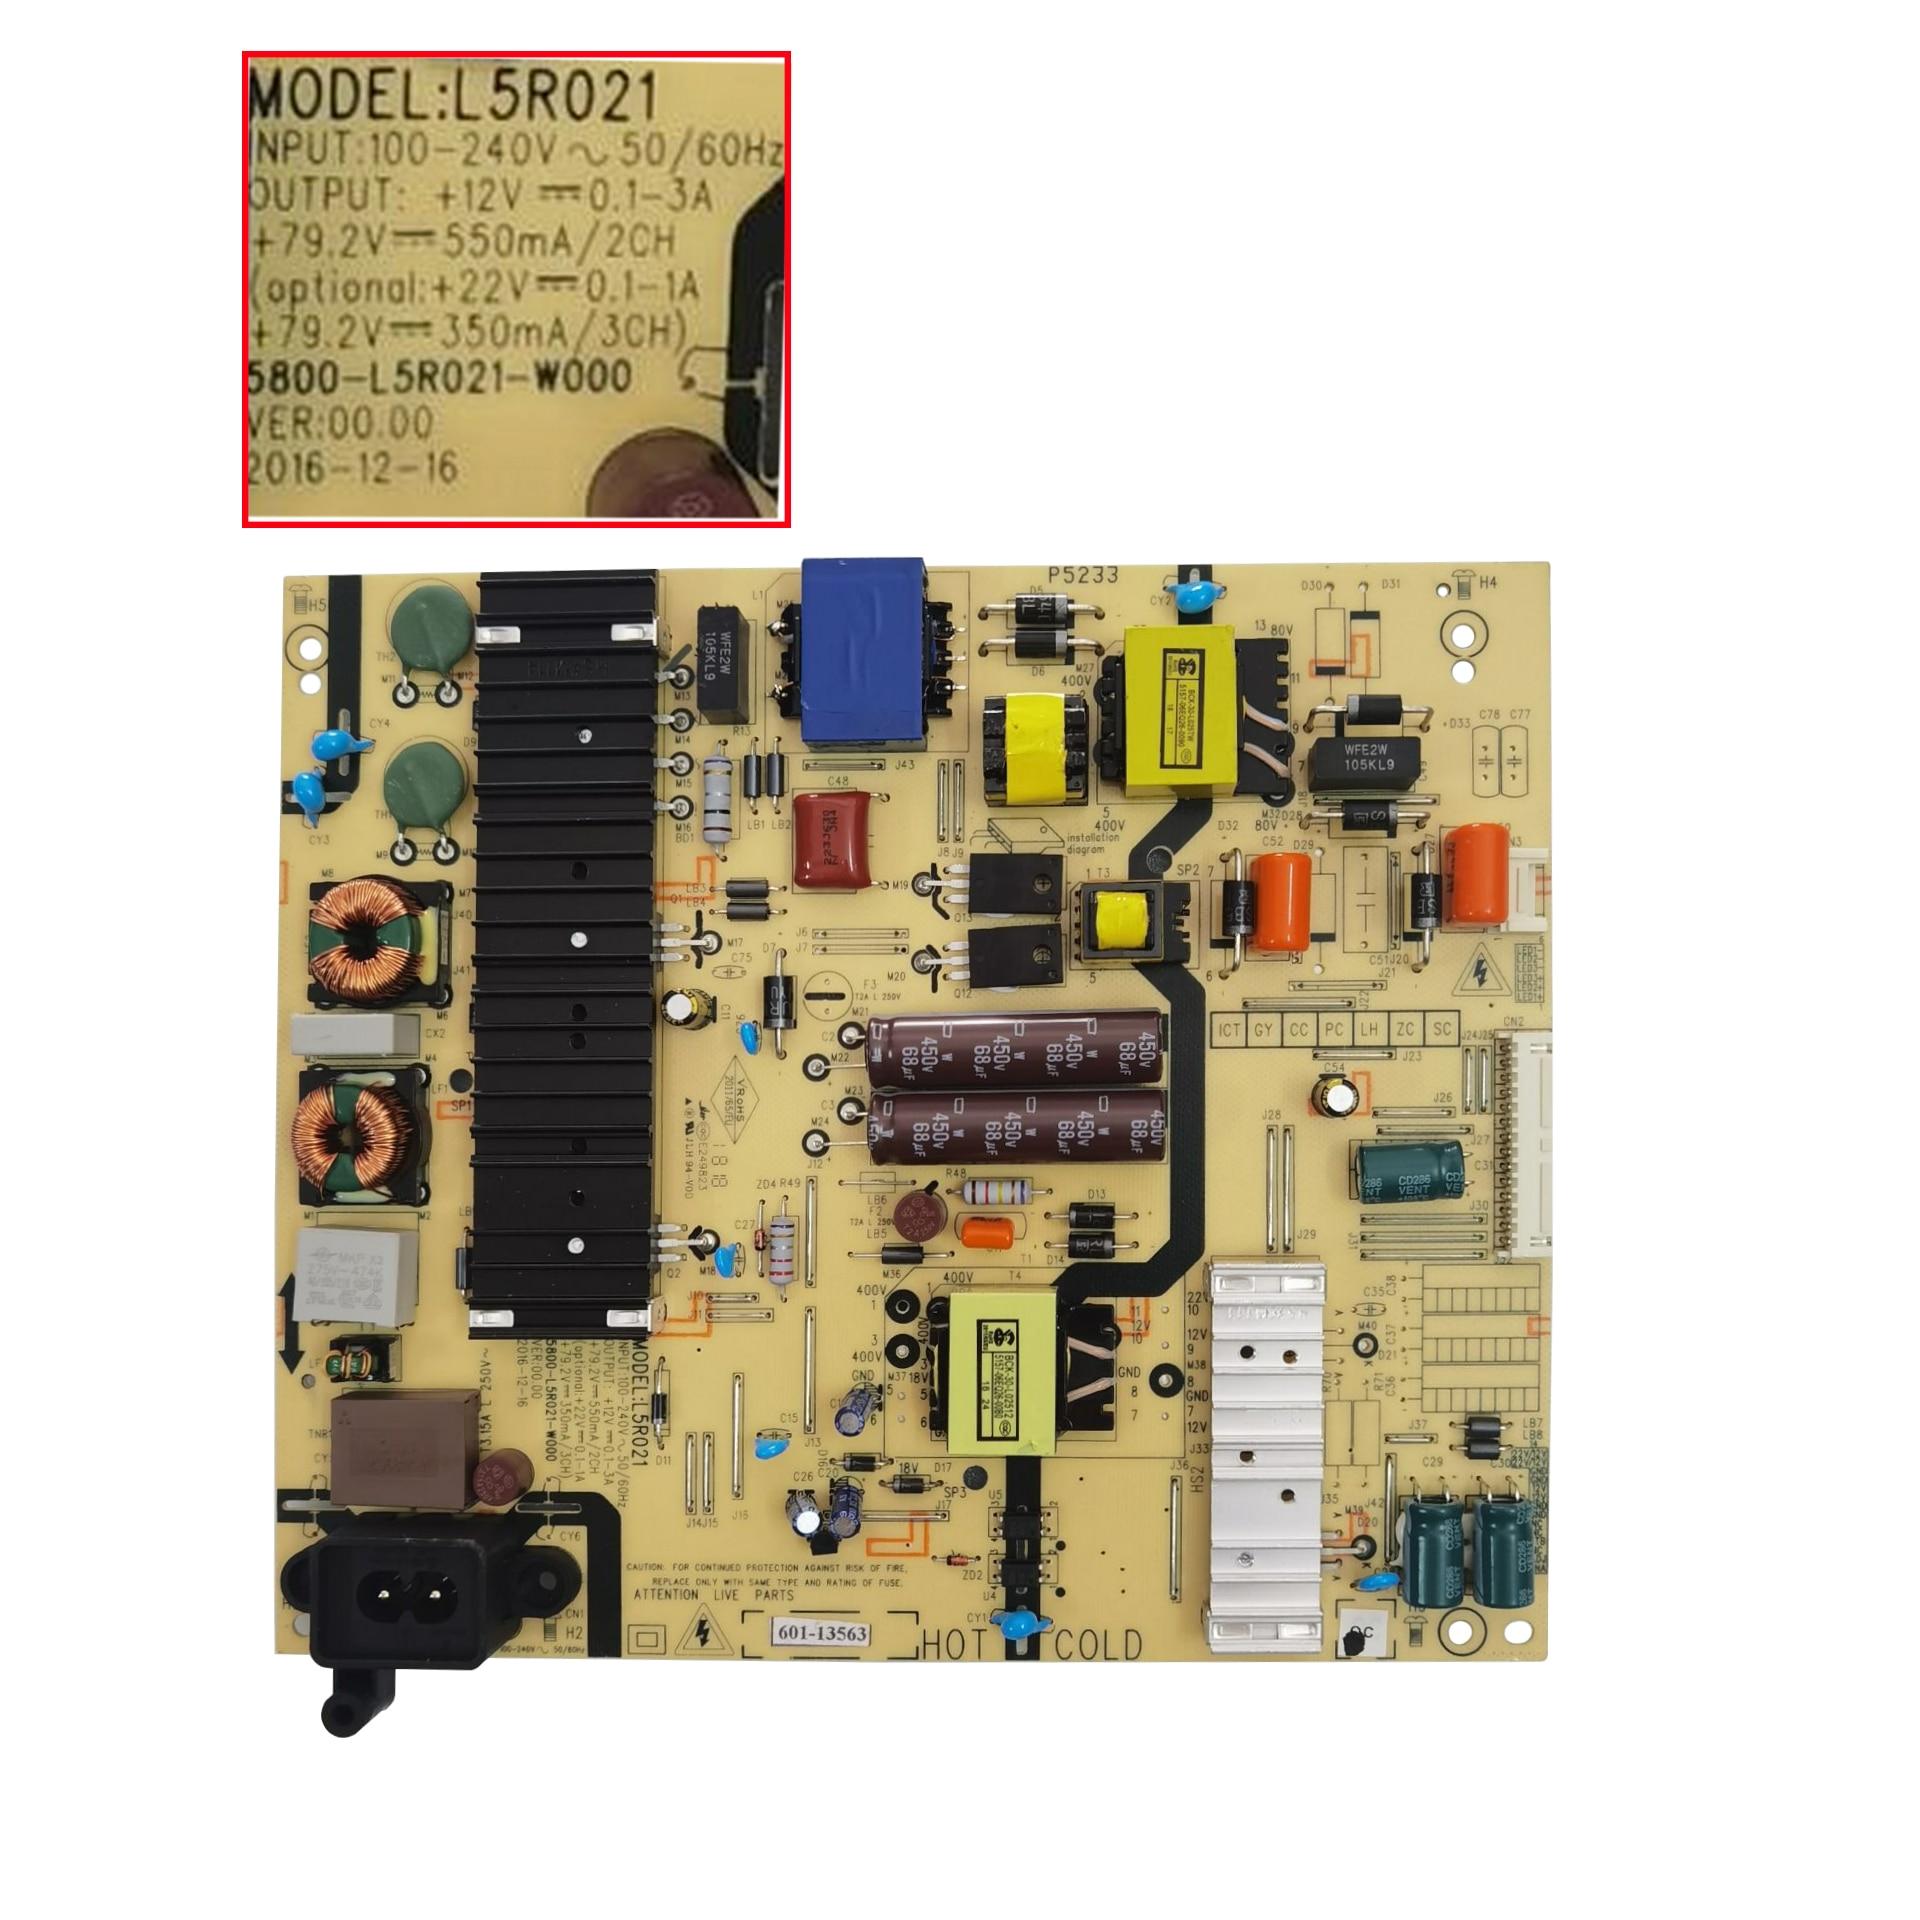 55E388G امدادات الطاقة مجلس L5R021 5800-L5R021-W000